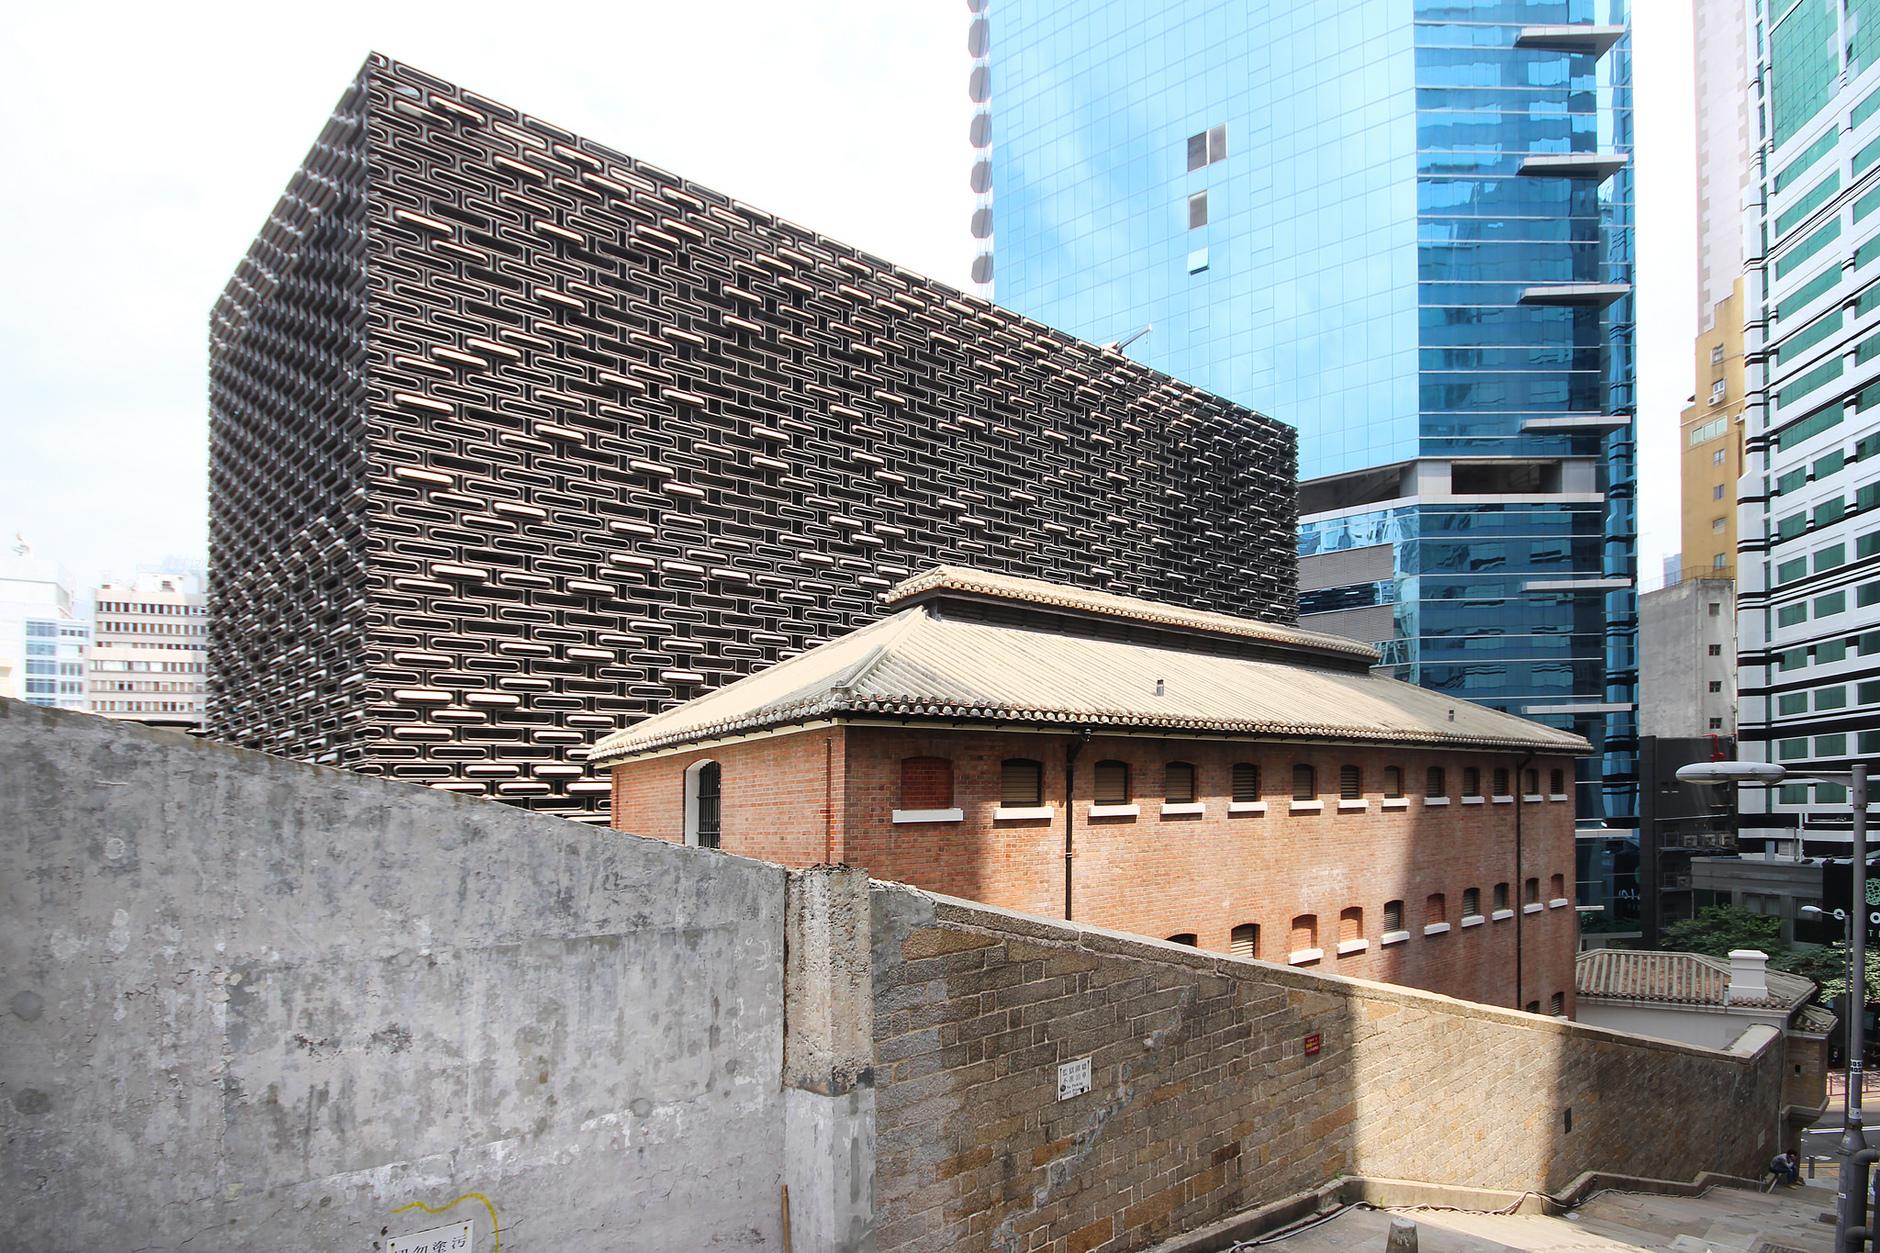 Арт-центр в Гонконге от Herzog & de Meuron (галерея 12, фото 3)